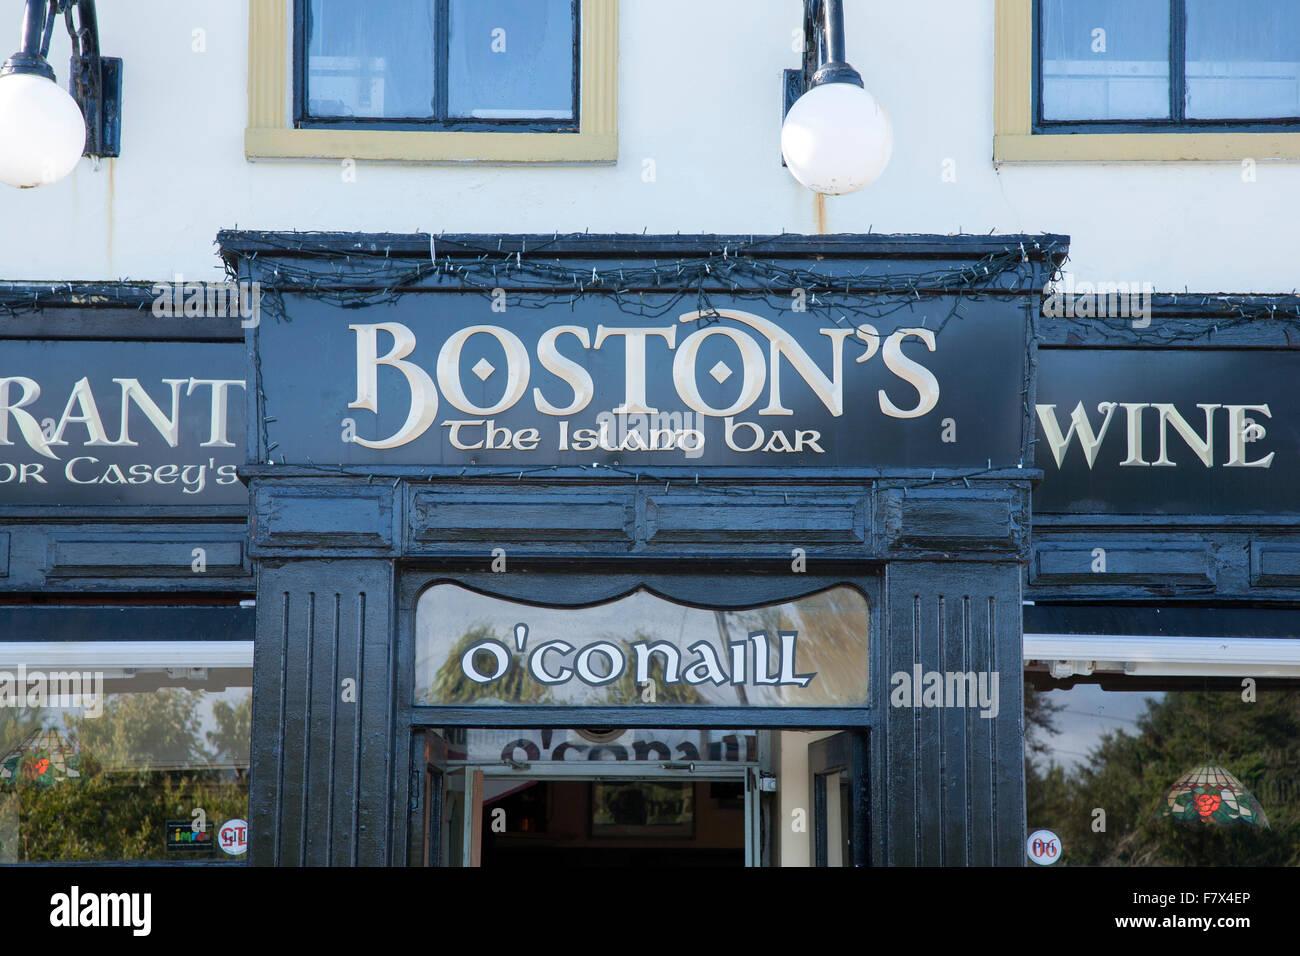 Boston S Bar Valentia Island